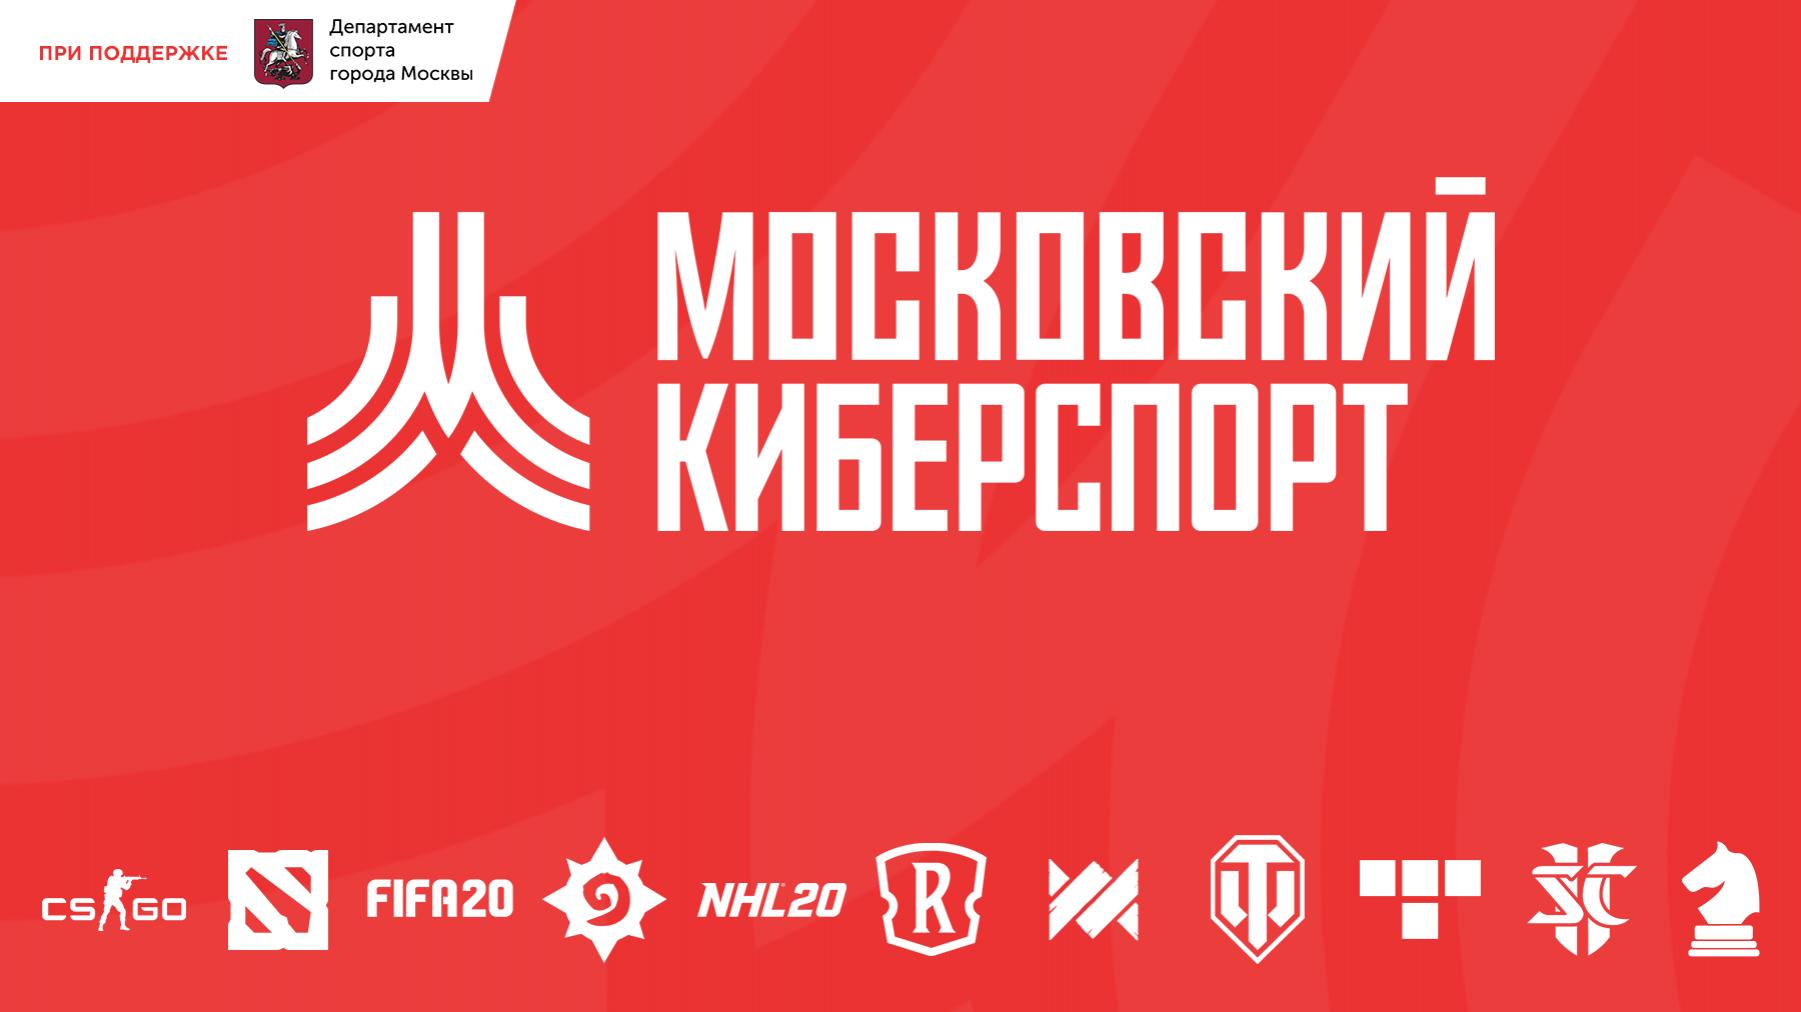 Московский Киберспорт за 4 месяца провел более 200 онлайнтурниров